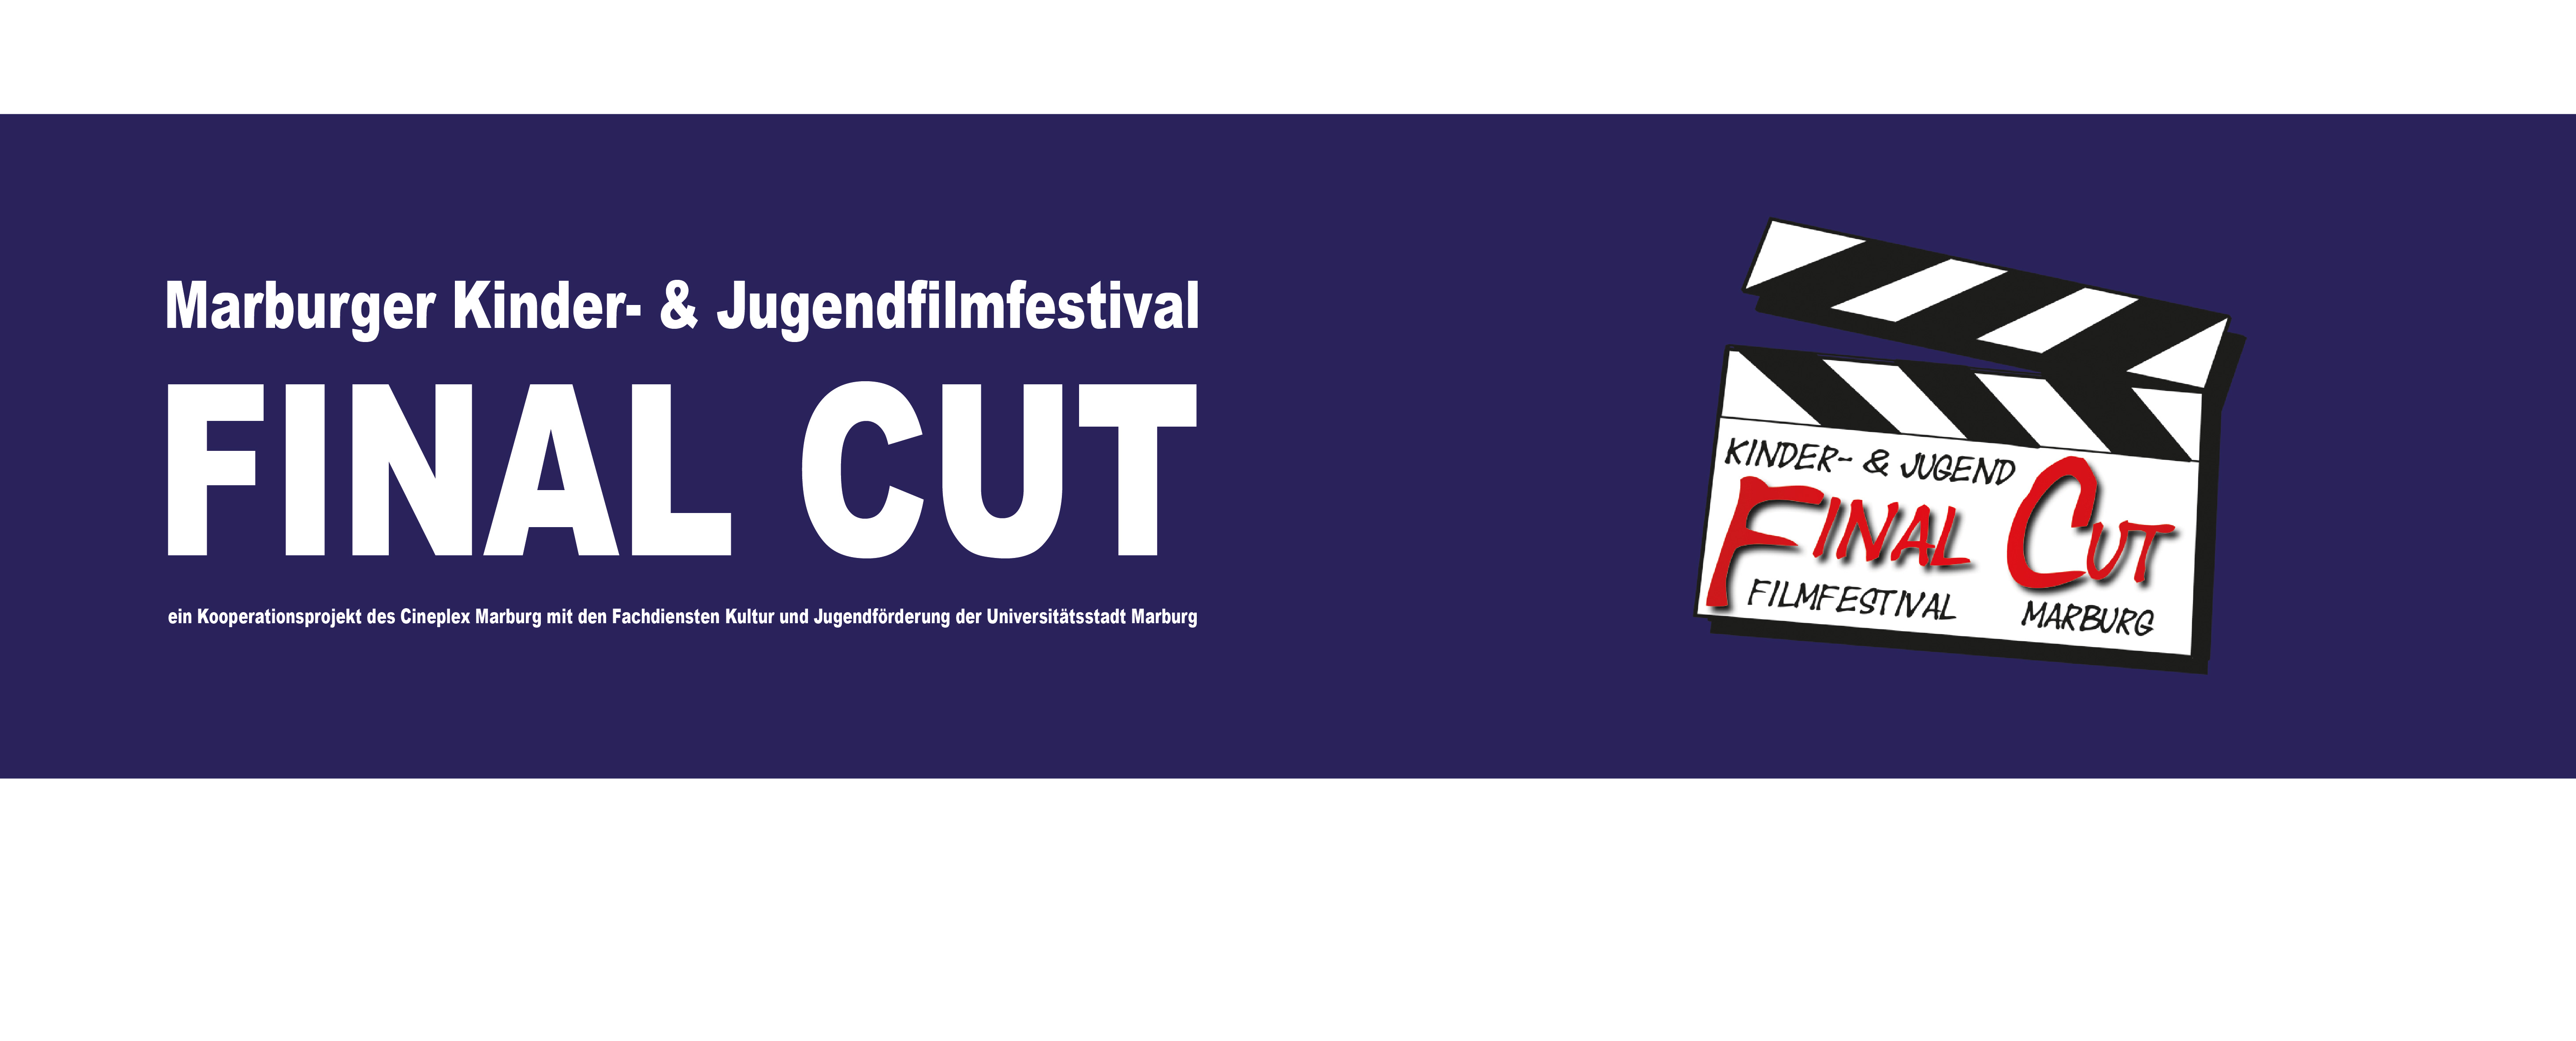 Filmfestival Marburg